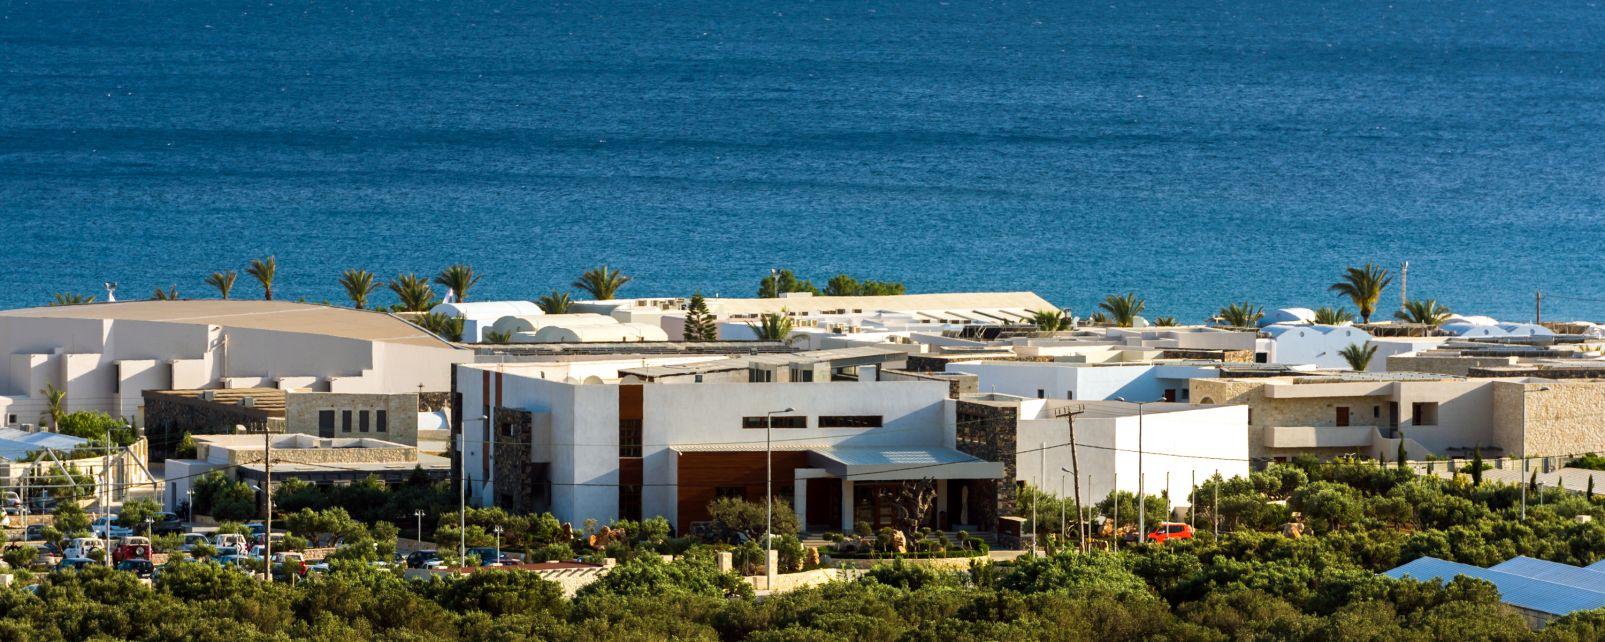 Club Jet Tours Ostria beach